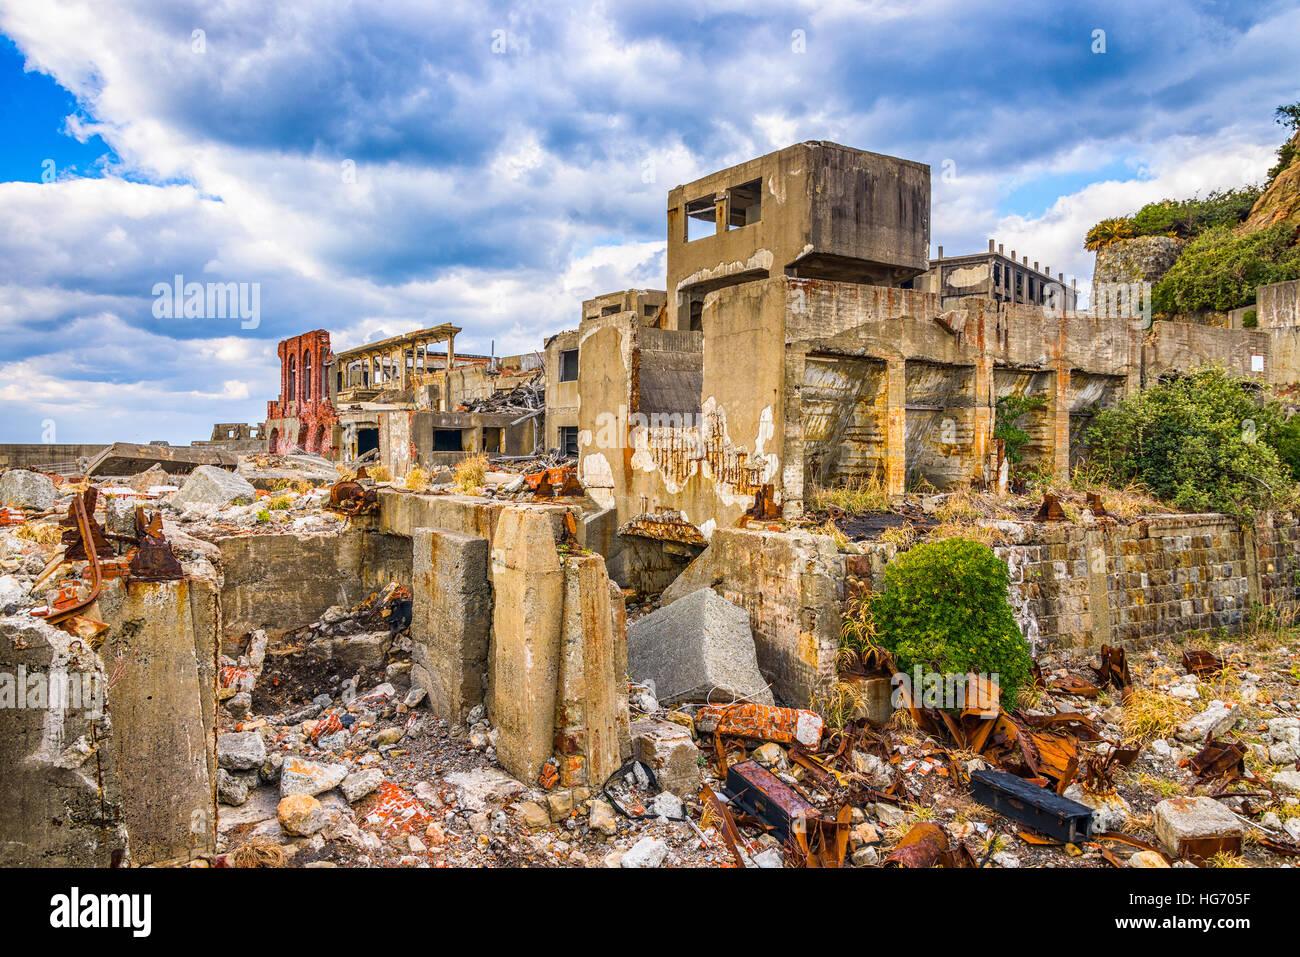 Abandoned island of Gunkanjima, Nagasaki, Japan. - Stock Image